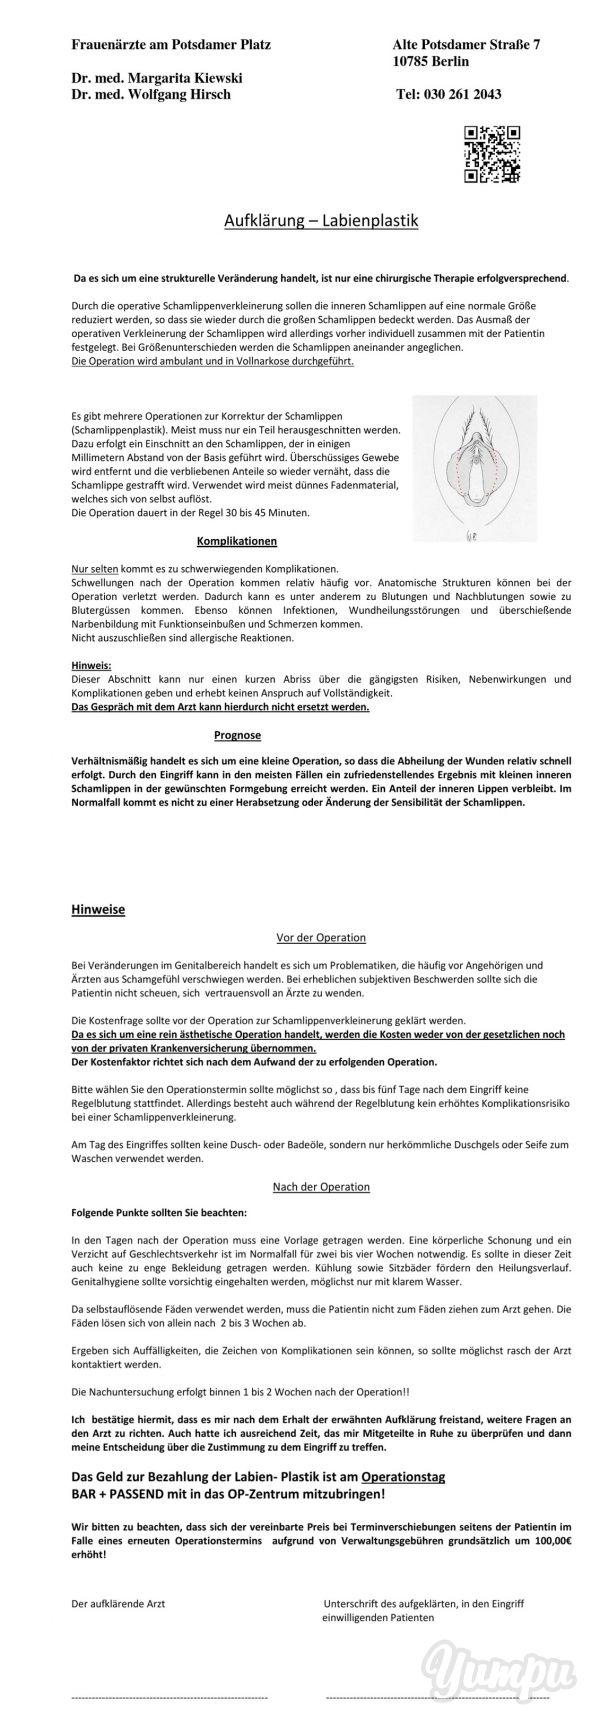 http://www.frauenaerzte-am-potsdamer-platz.de/Schamlippenplastik Aufklärung – Labienplastik - Magazine with 3 pages: